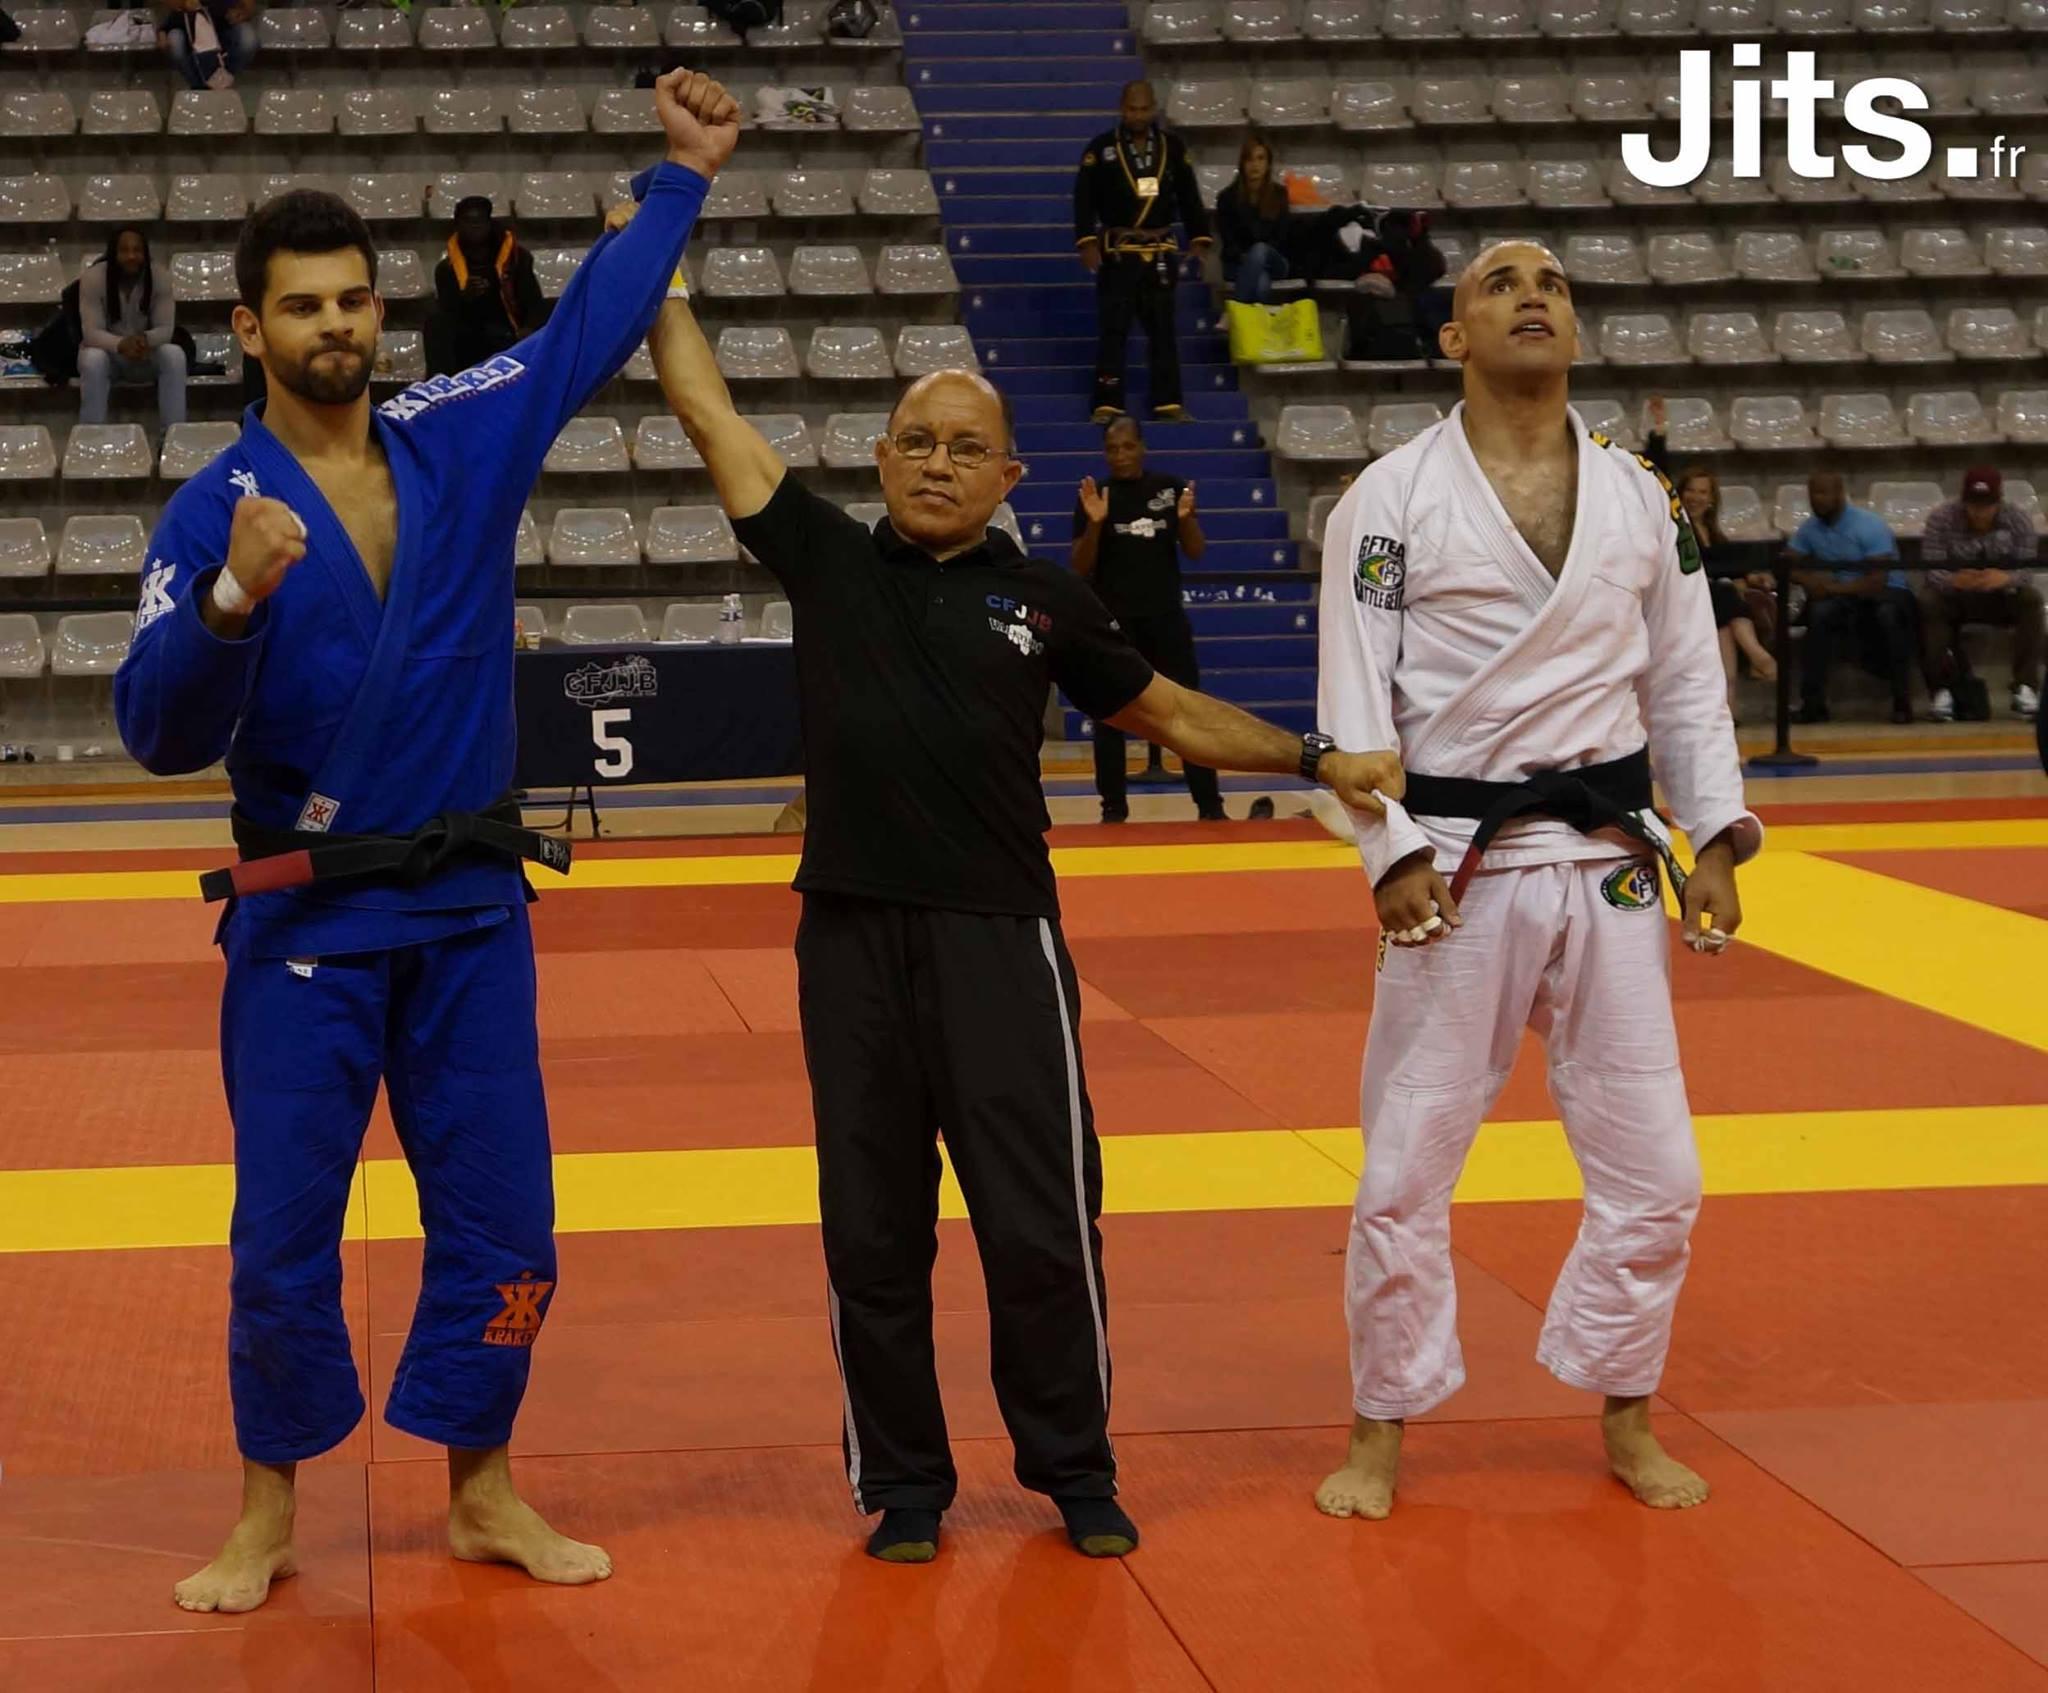 JJB - pour qui  - Académie Pythagore - Jiu Jitsu Brésilien et Mixed ... 2ffe5288a97